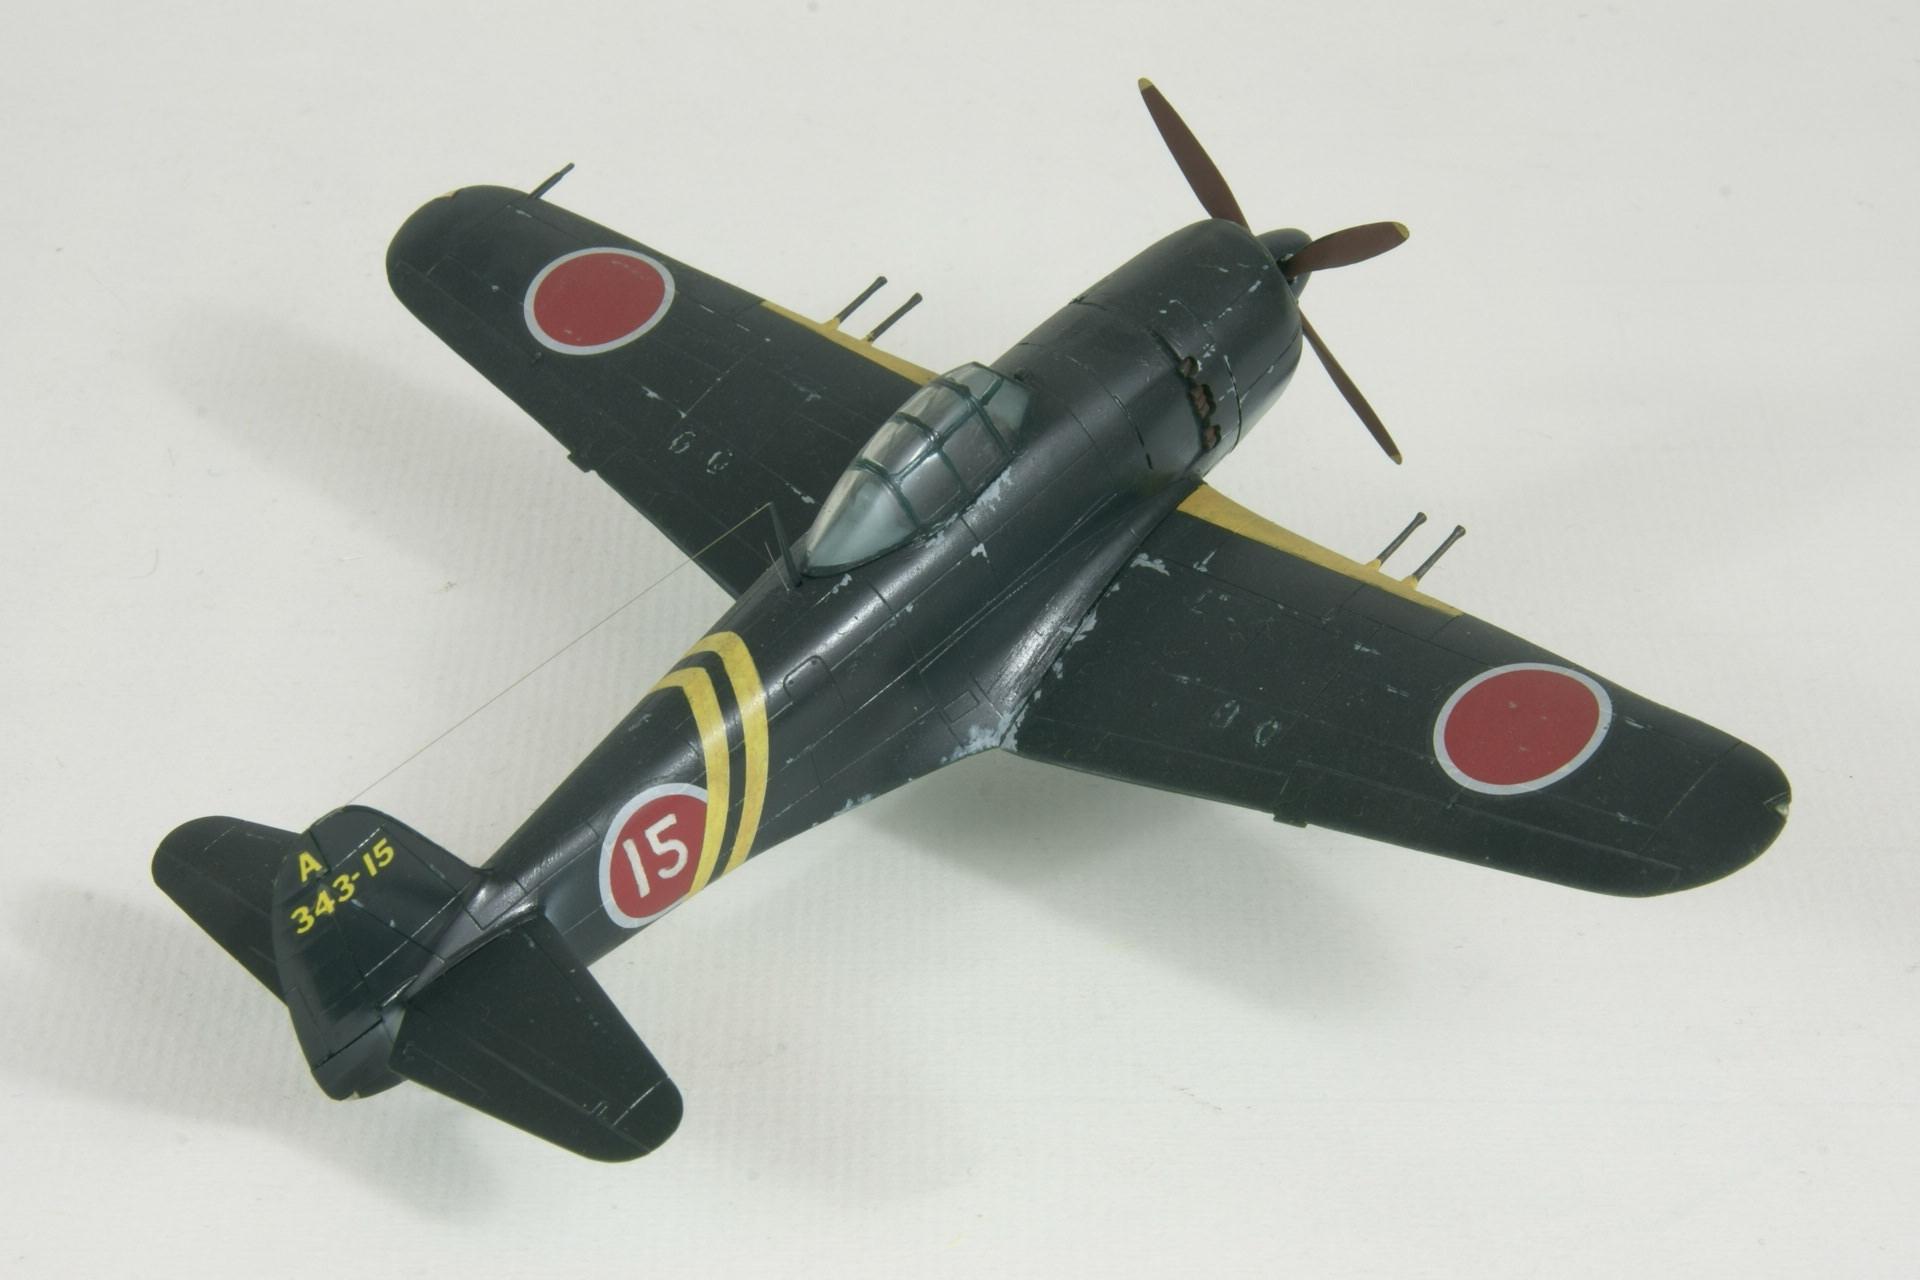 Kawanishi n1k2 j george 3 1